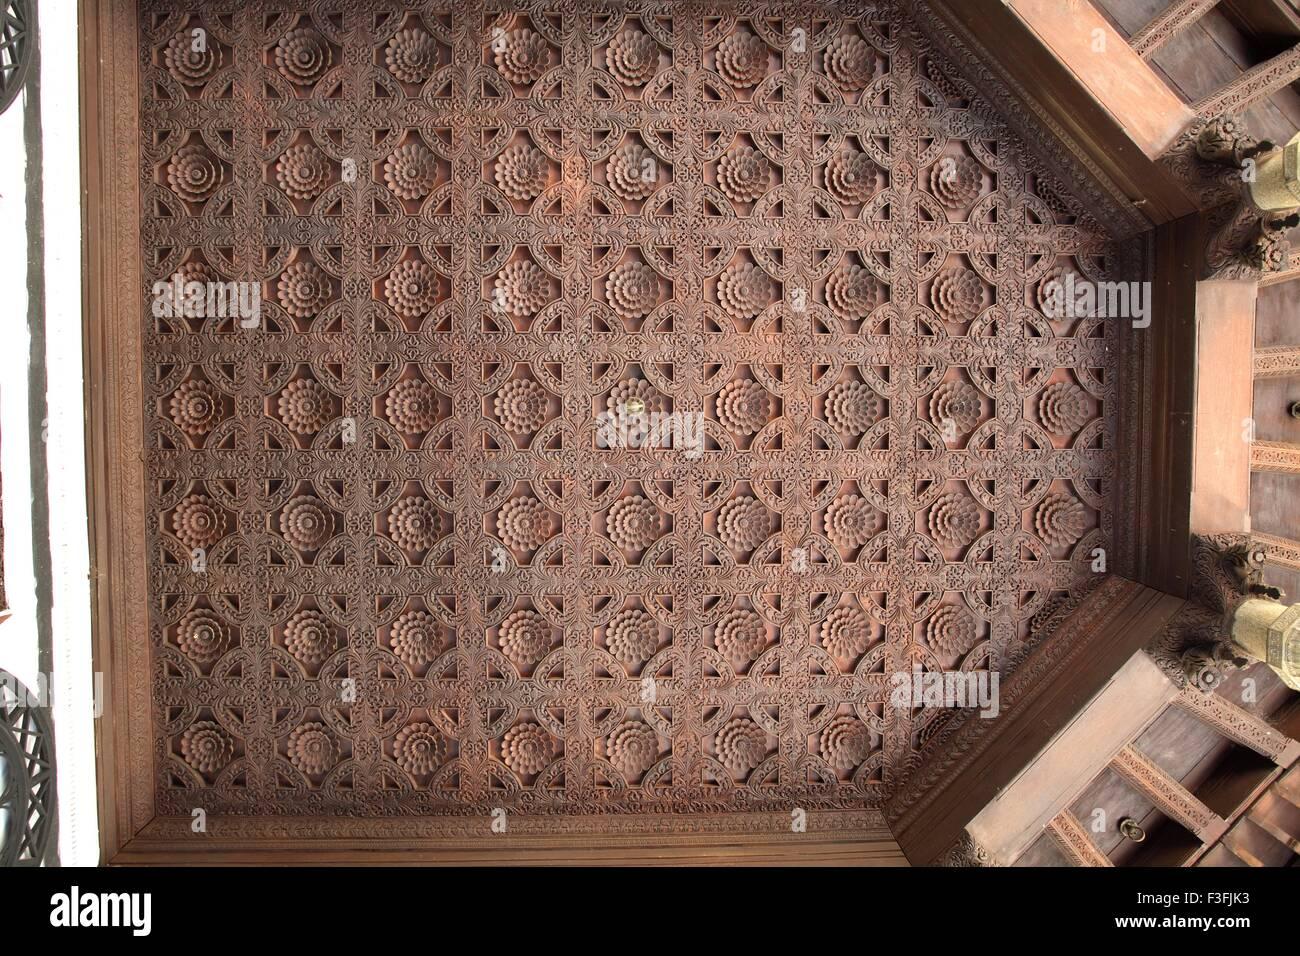 Design Pattern Of Wood Carving Lotus Flowers On Ceiling Corridor Puthen Maliga Palace MuseumTrivandrum Kerala